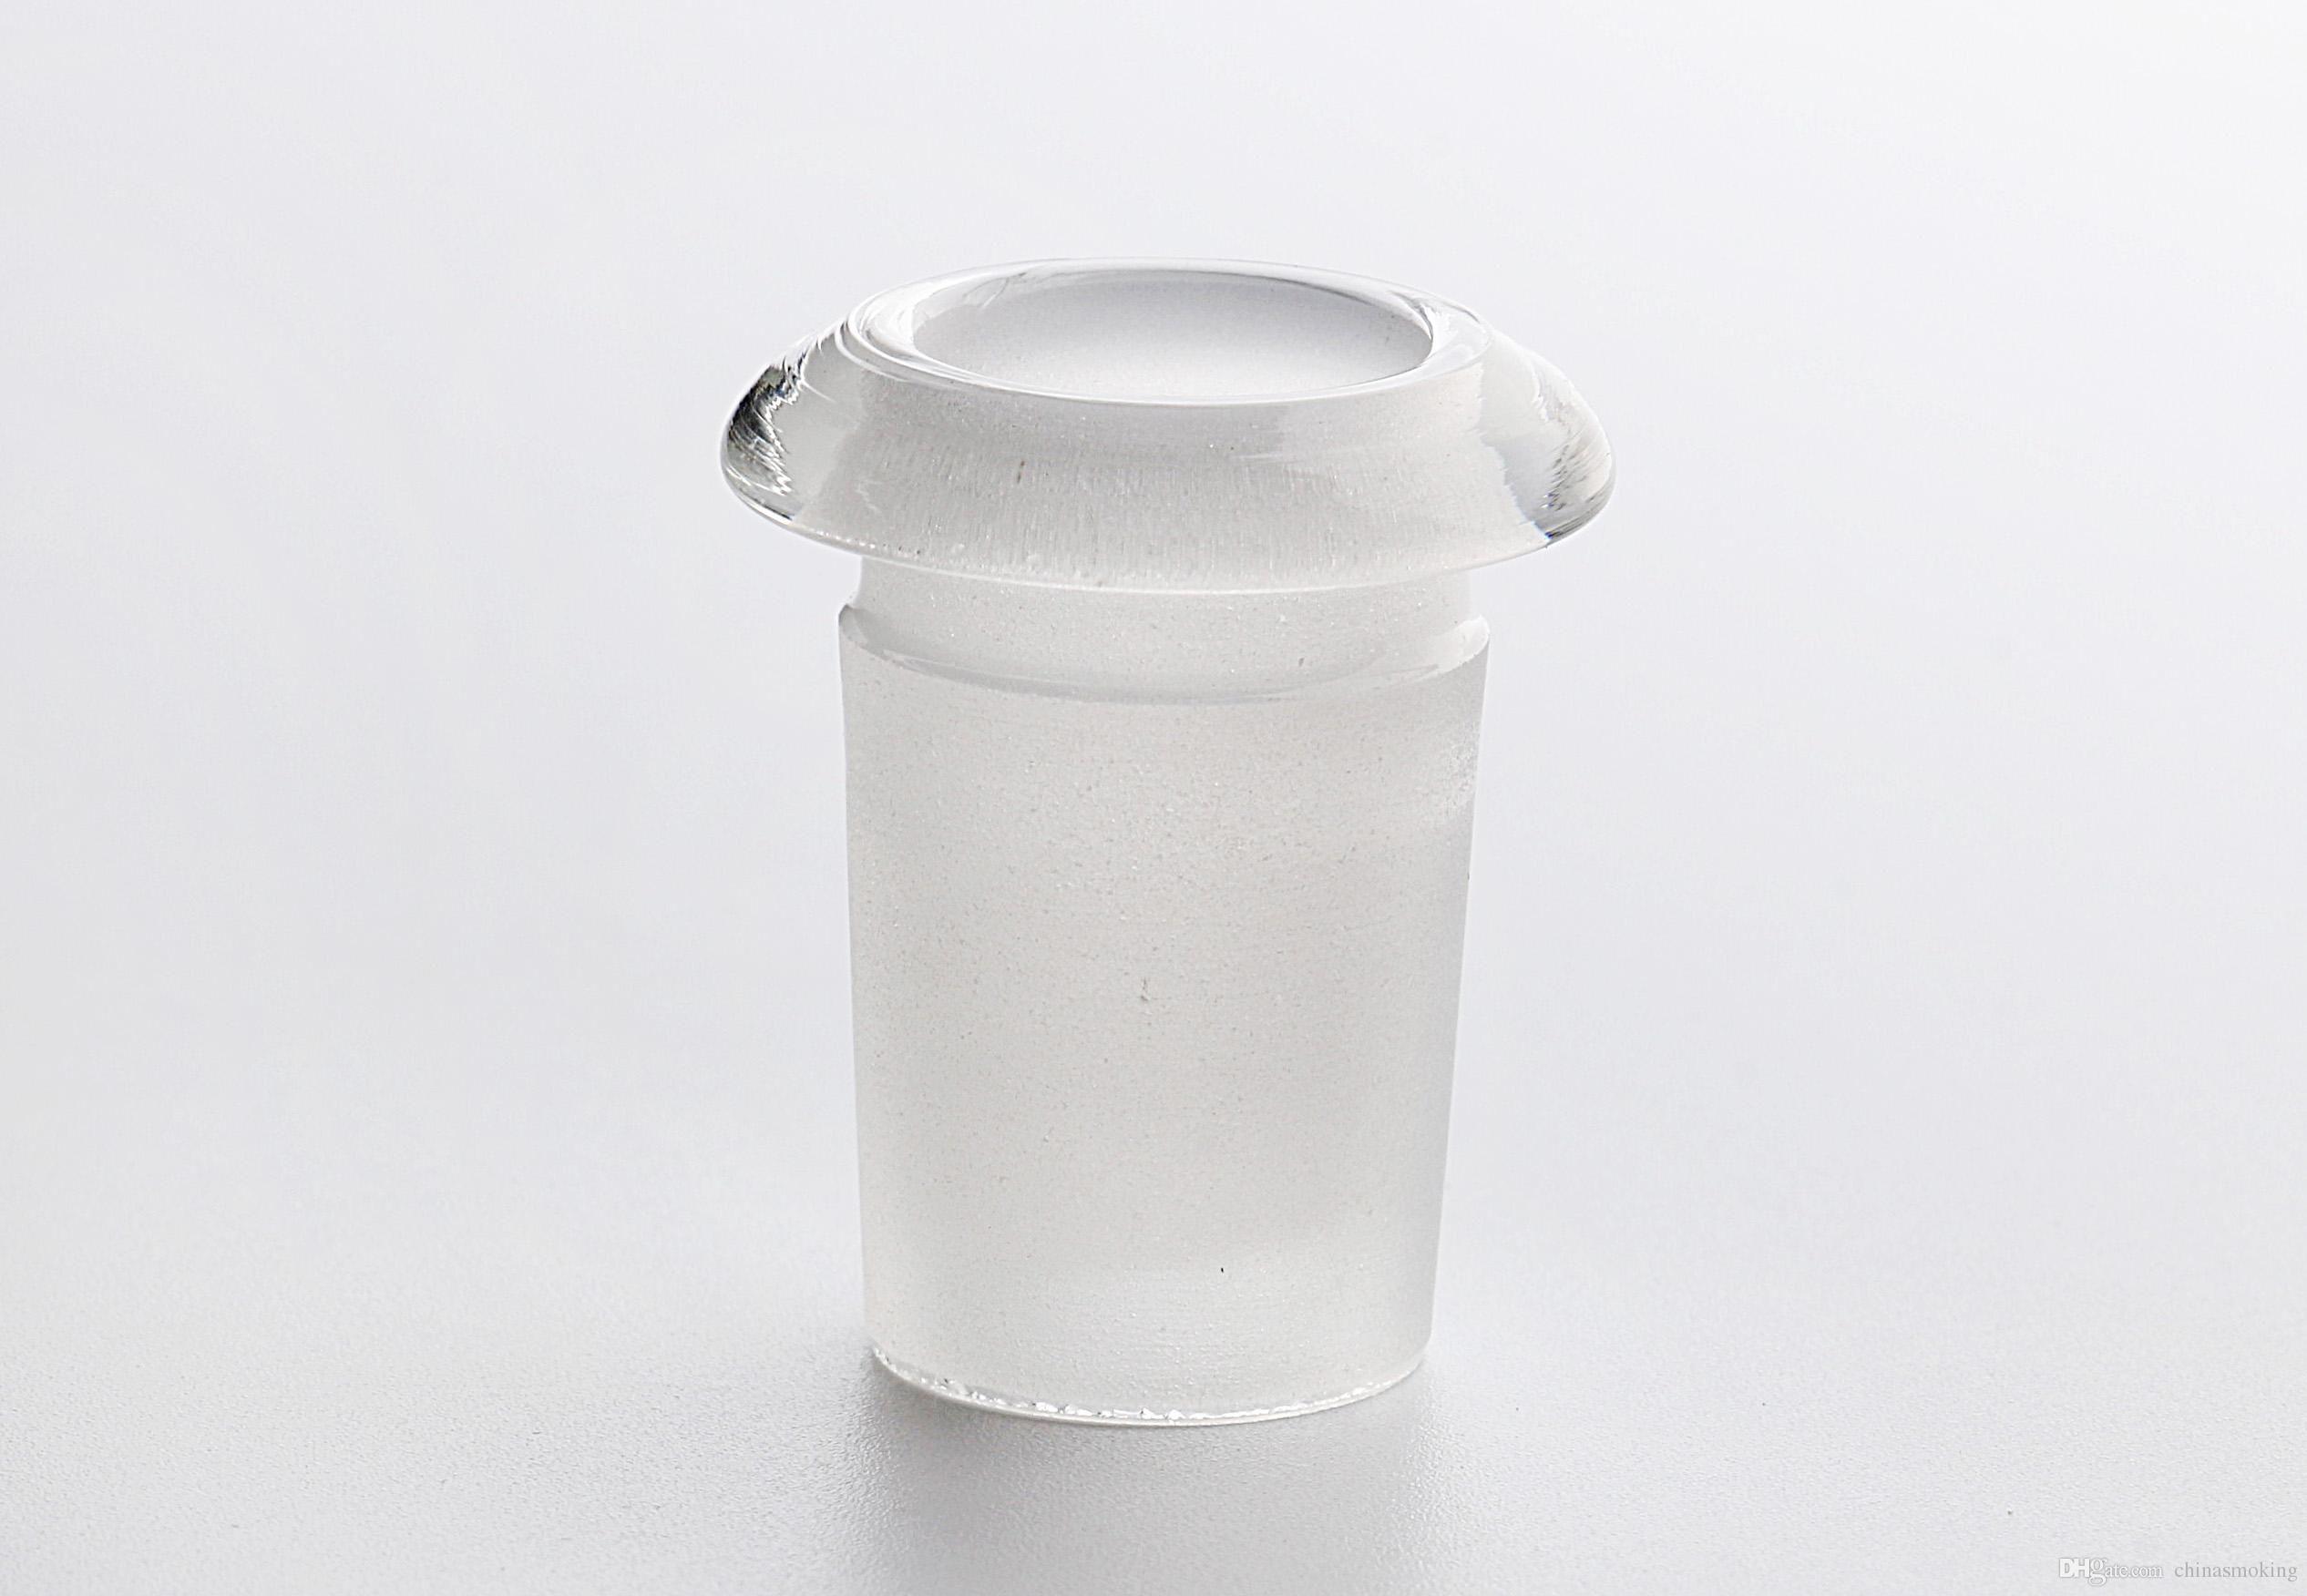 Korte Glasadapter 14mm19mm Hoge Borosilicaat Glas Dorp Down 14mm Vrouw tot 19mm Mannelijk Adapter Hoog Borosilicaat Glas